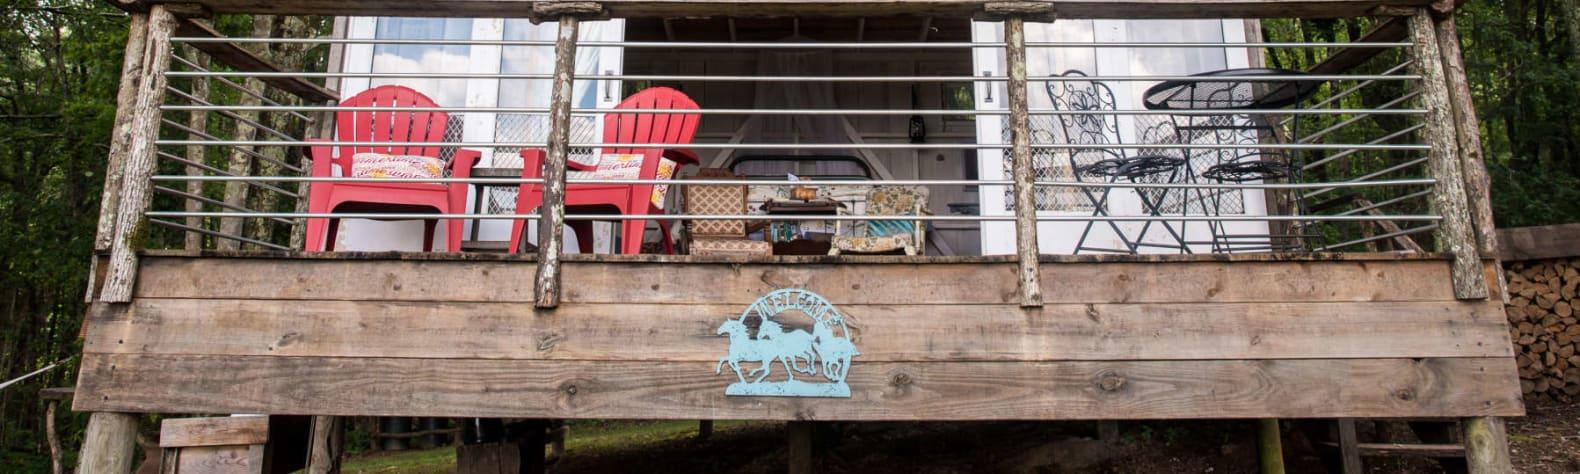 Grandview Camp- 116 Acres